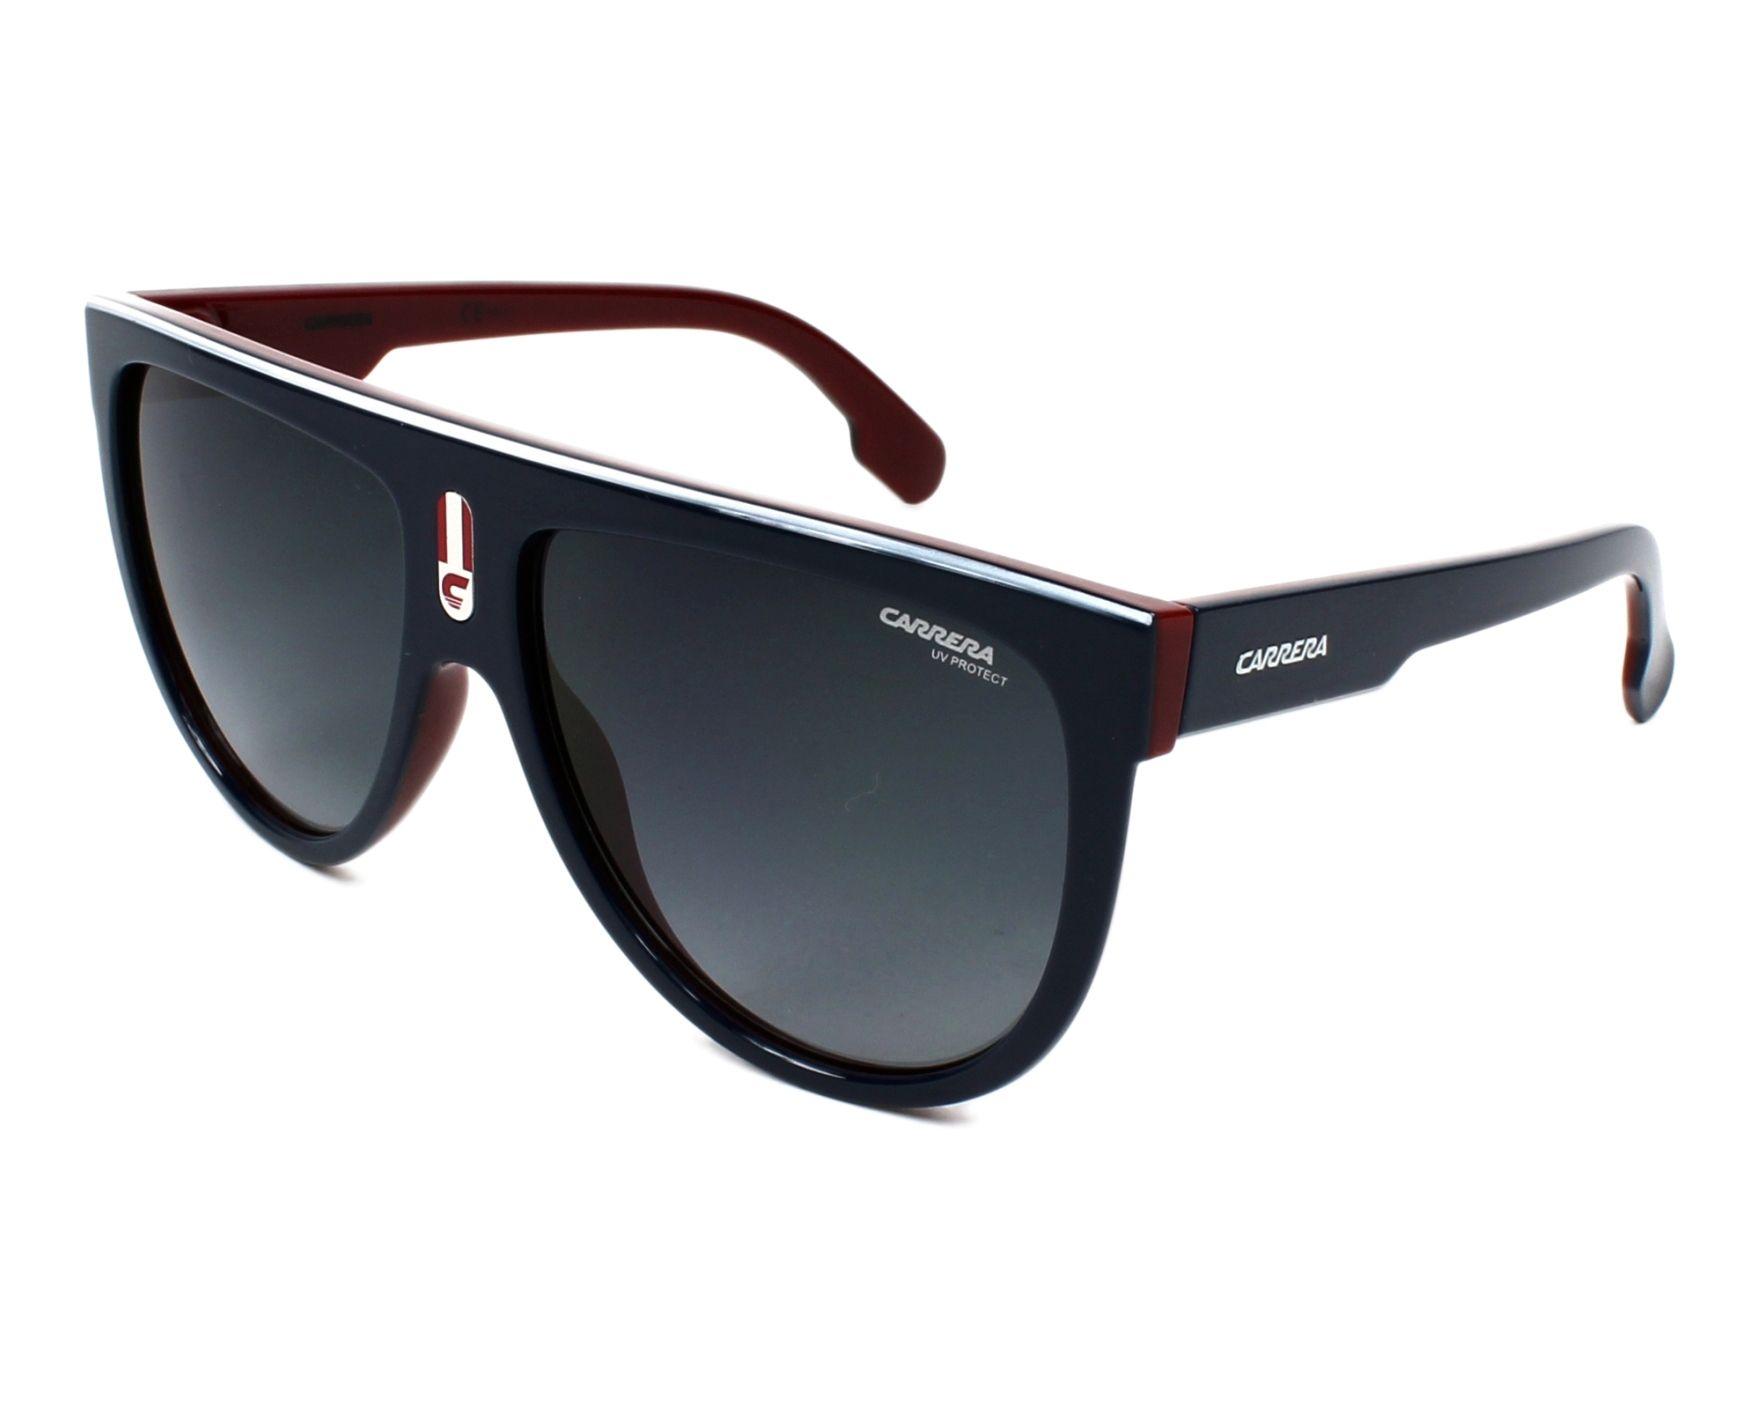 470e16c7c3f61 thumbnail Sunglasses Carrera FLAGTOP 8RU 9O - Blue Bordeaux profile view